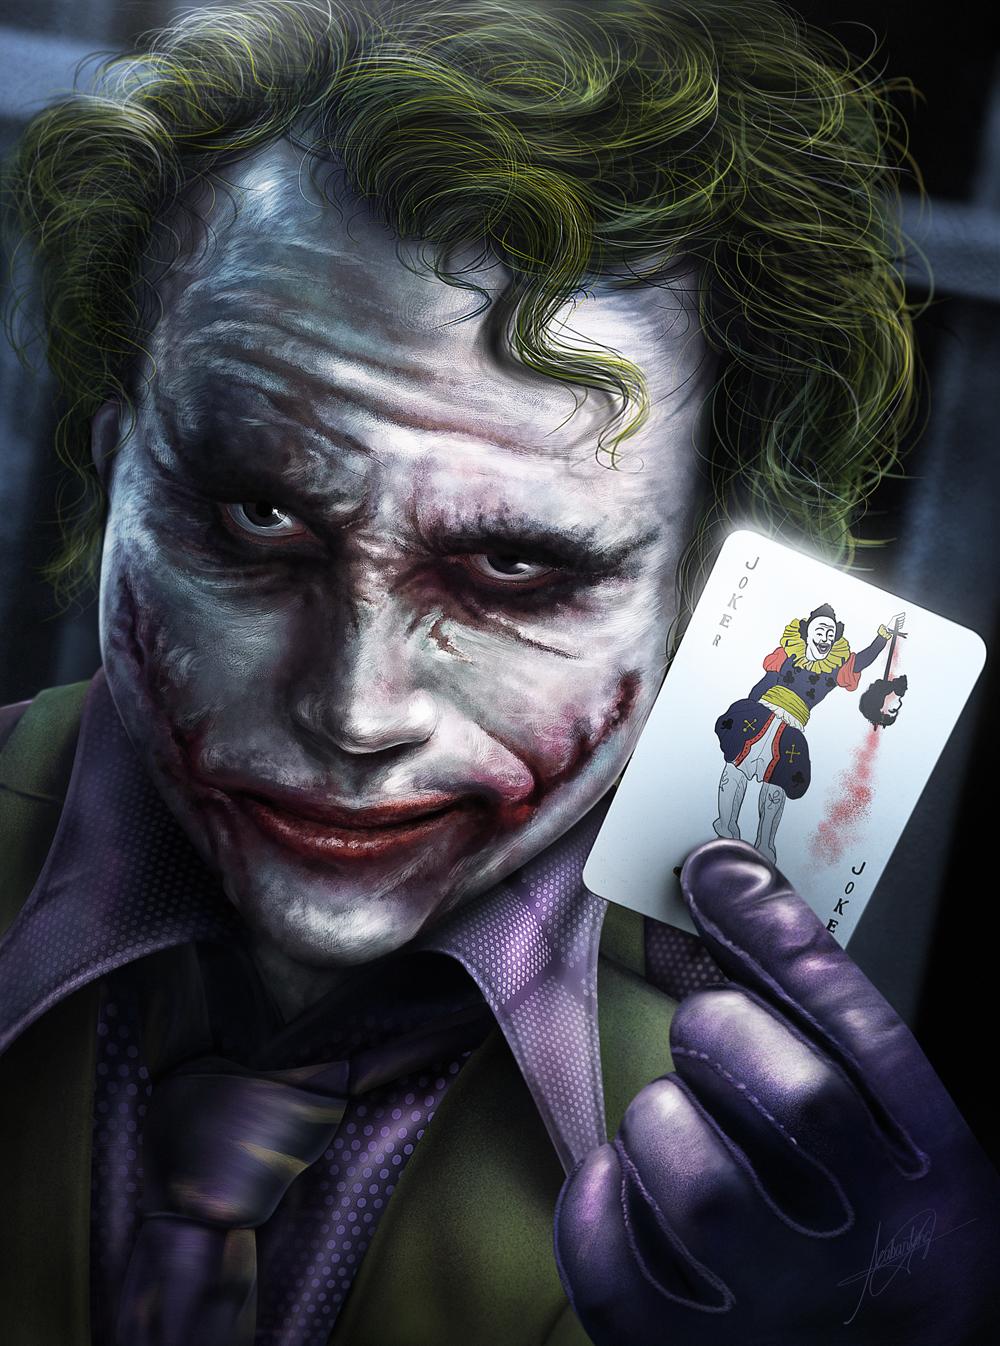 Joker-FA-FLAT-option-1-smaller